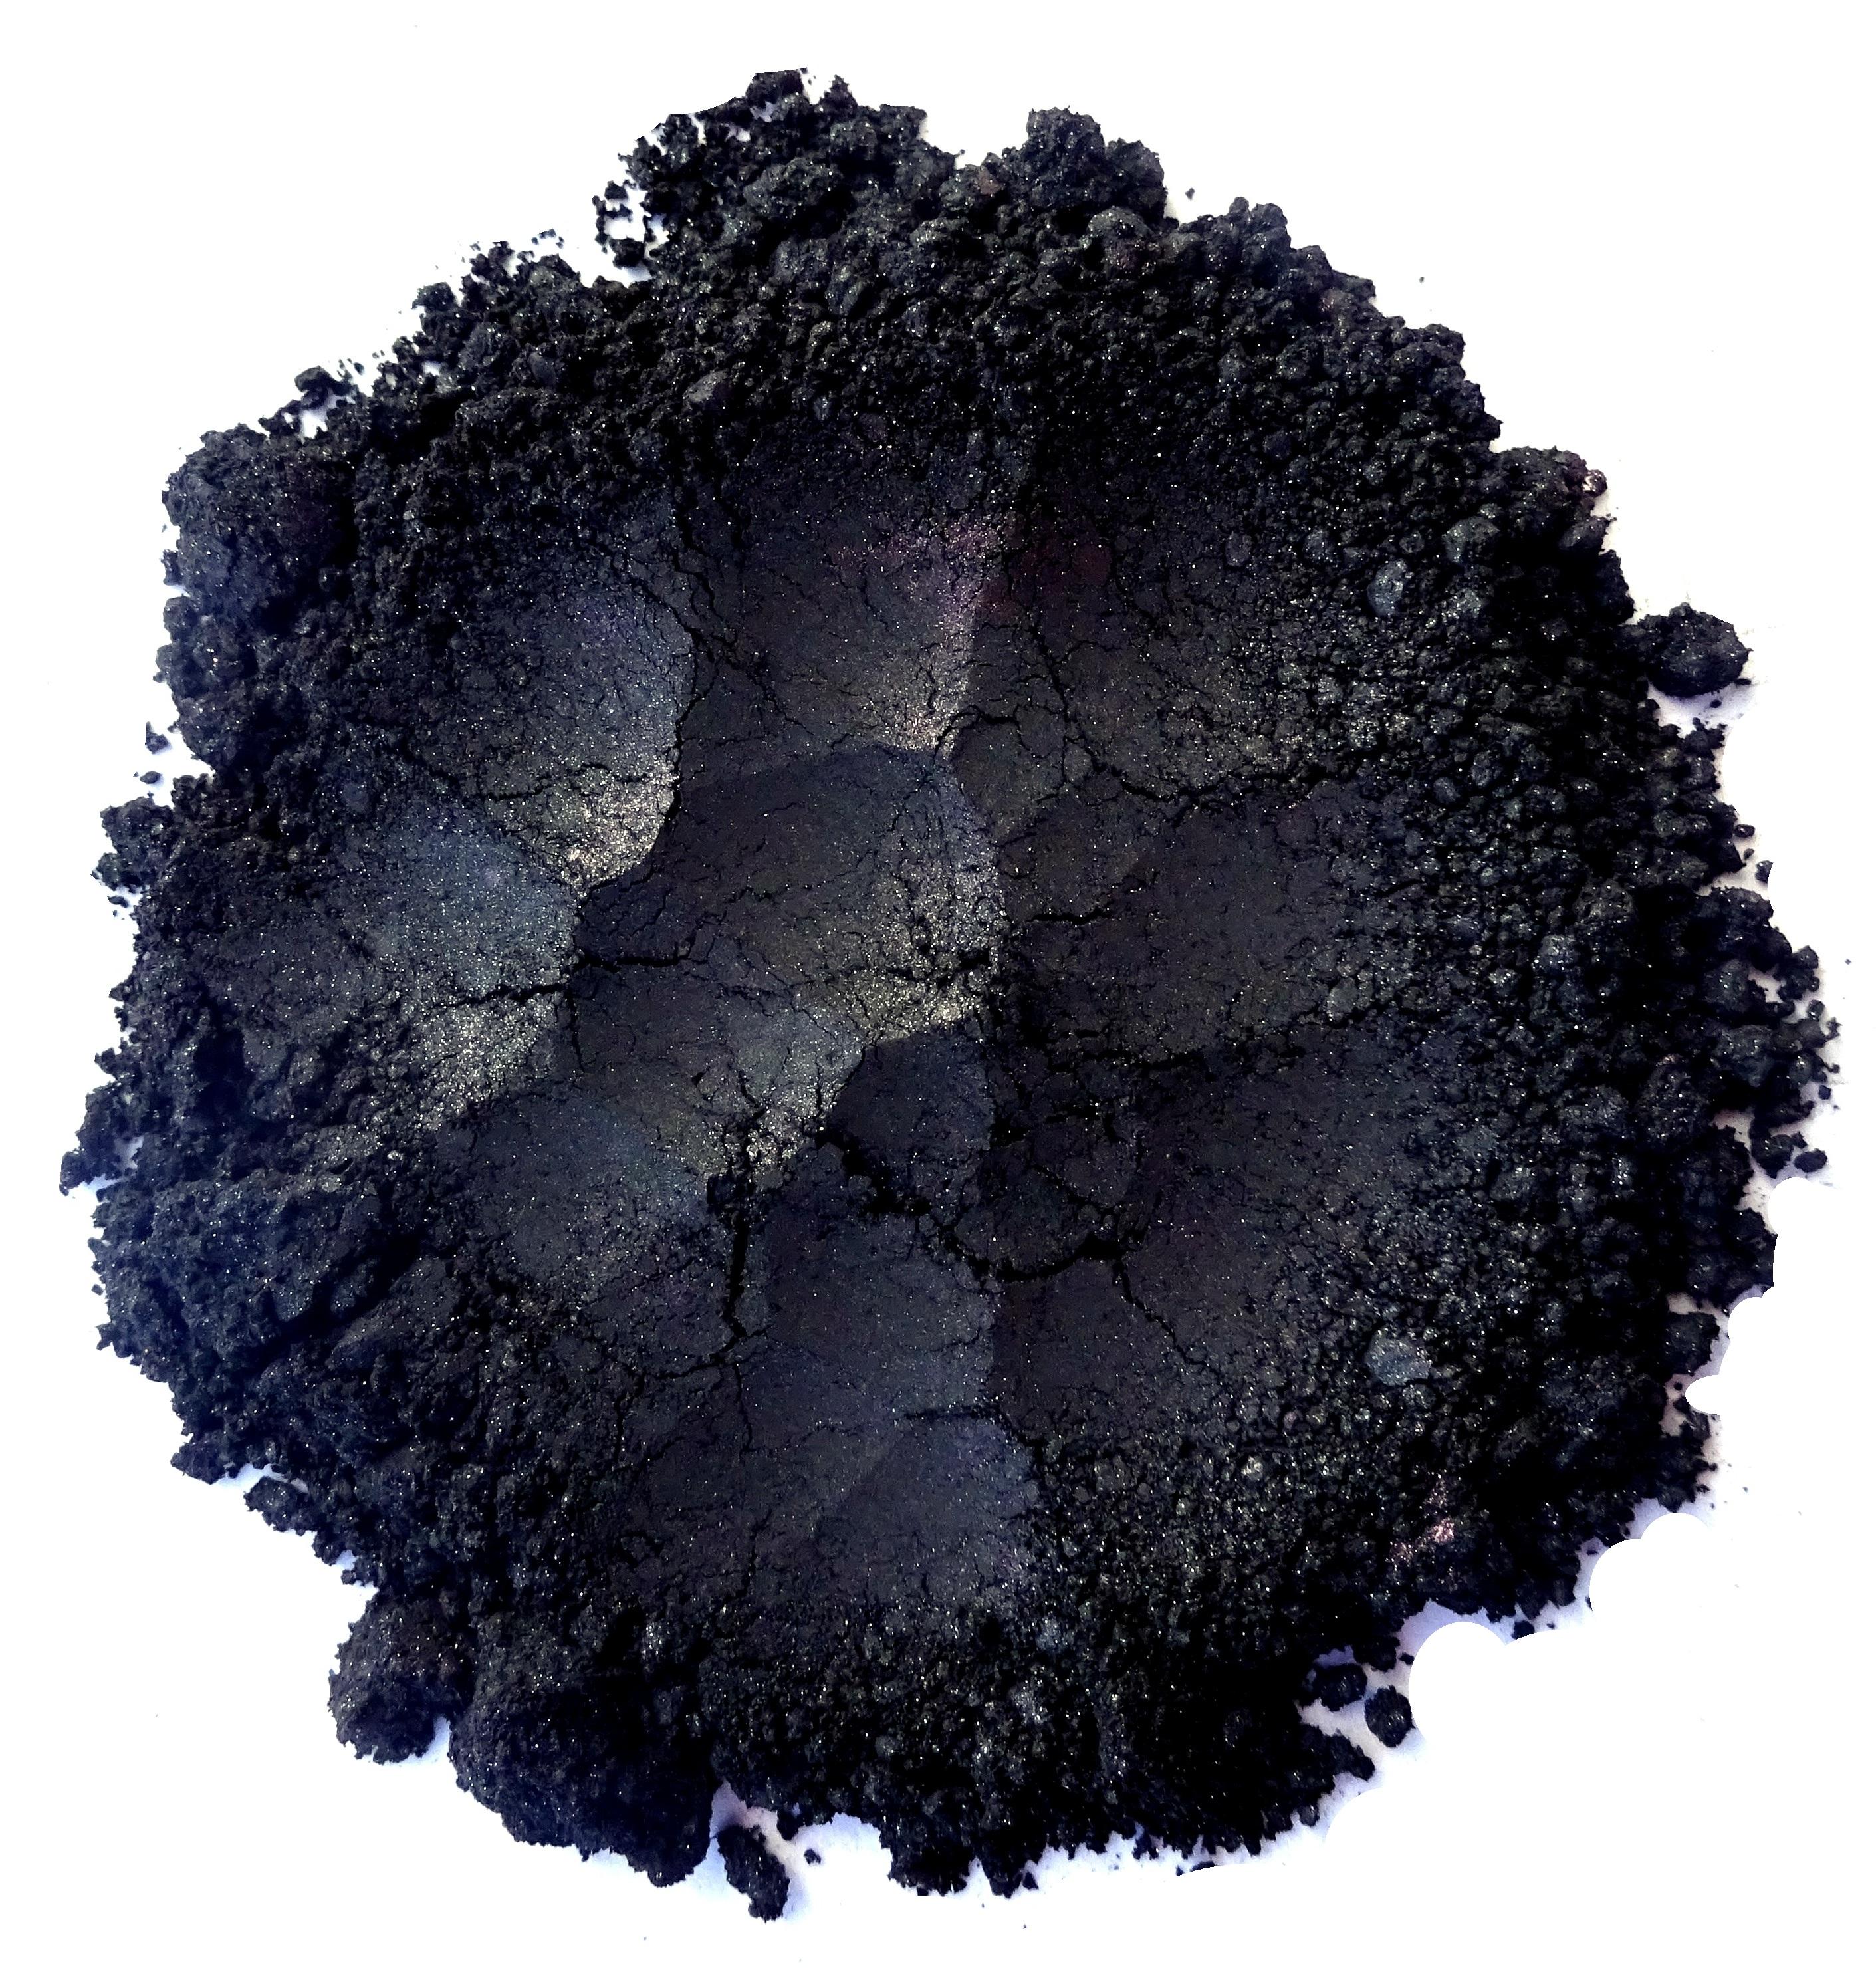 Black Mica